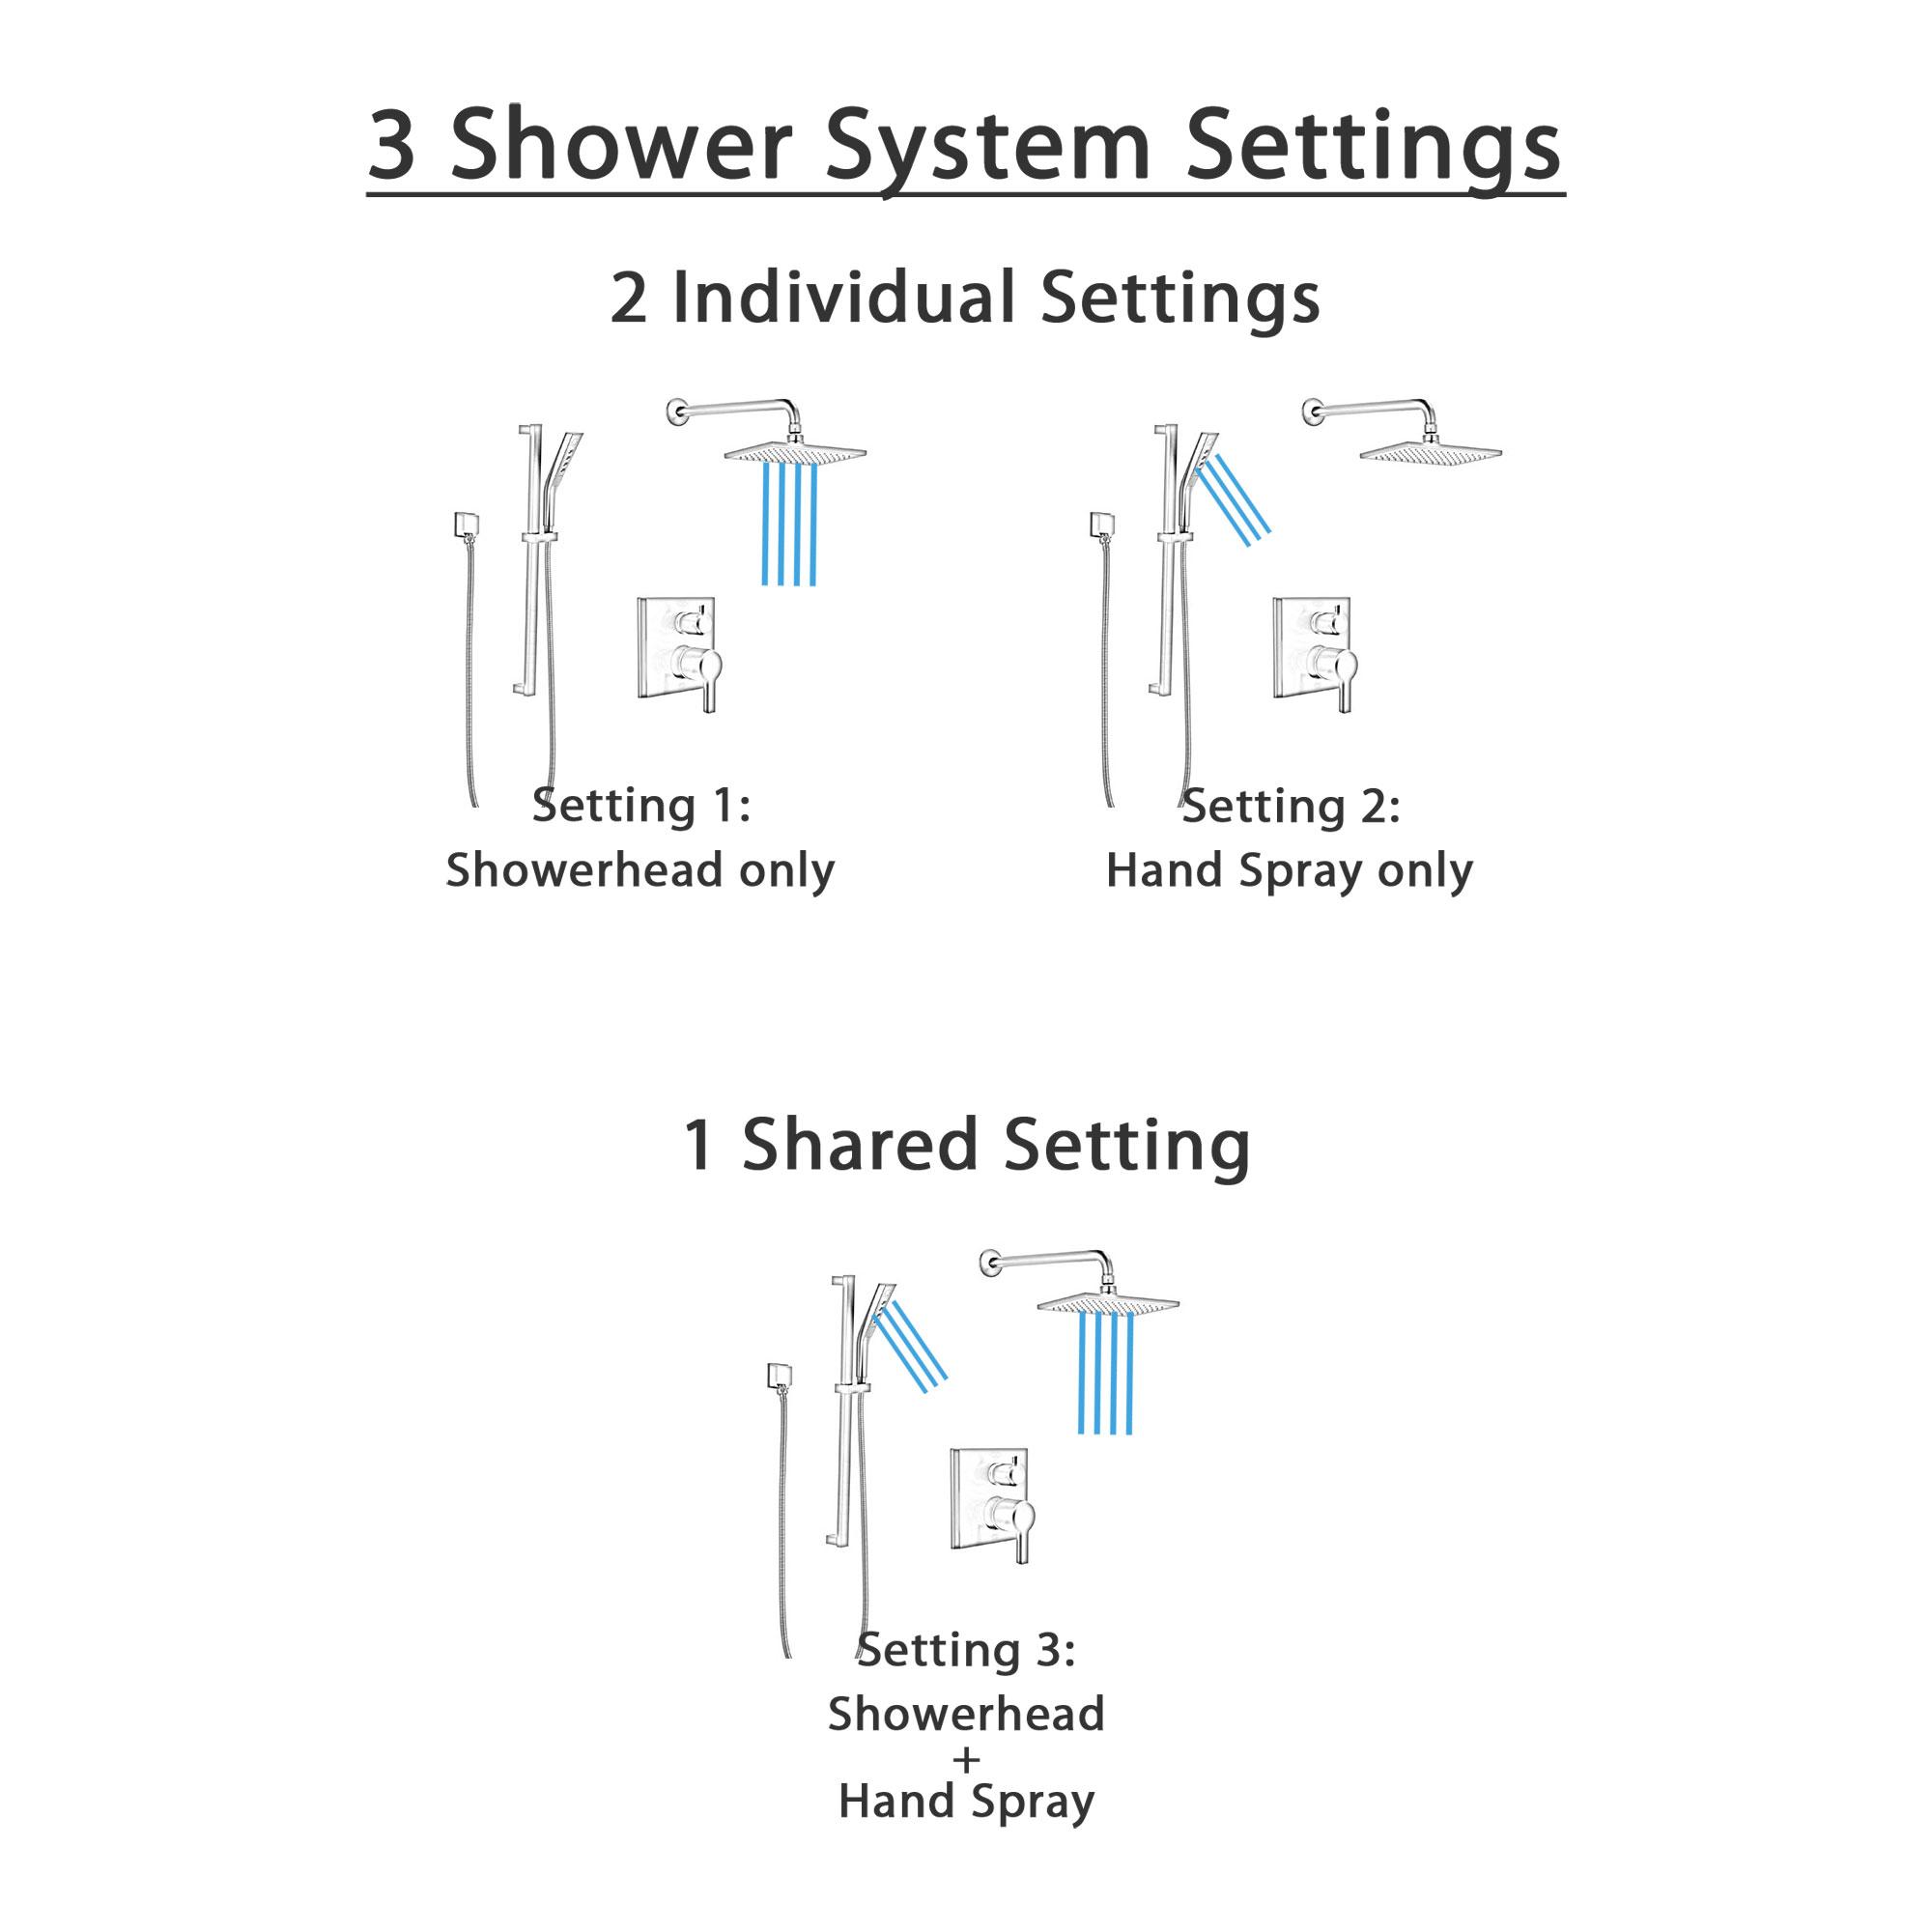 Delta Pivotal Matte Black Finish Shower System with Integrated Diverter, Modern Wall Mount Rain Showerhead, and Hand Sprayer on Slidebar SS24899BL4